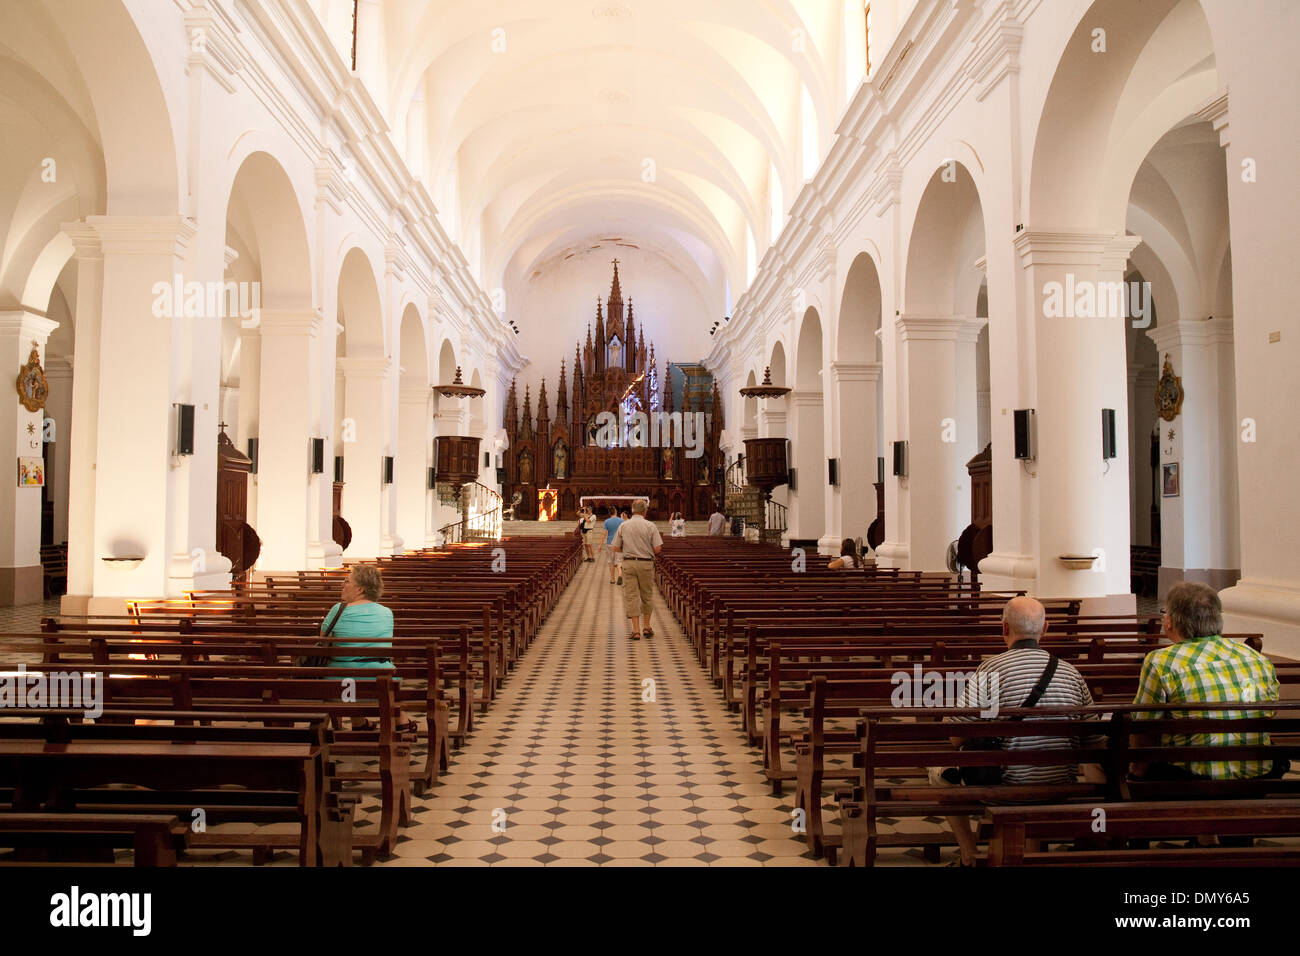 Interior of the Church of the Holy Trinity ( Iglesia Parroquial de la Santísima ); Trinidad, Cuba, Caribbean - Stock Image